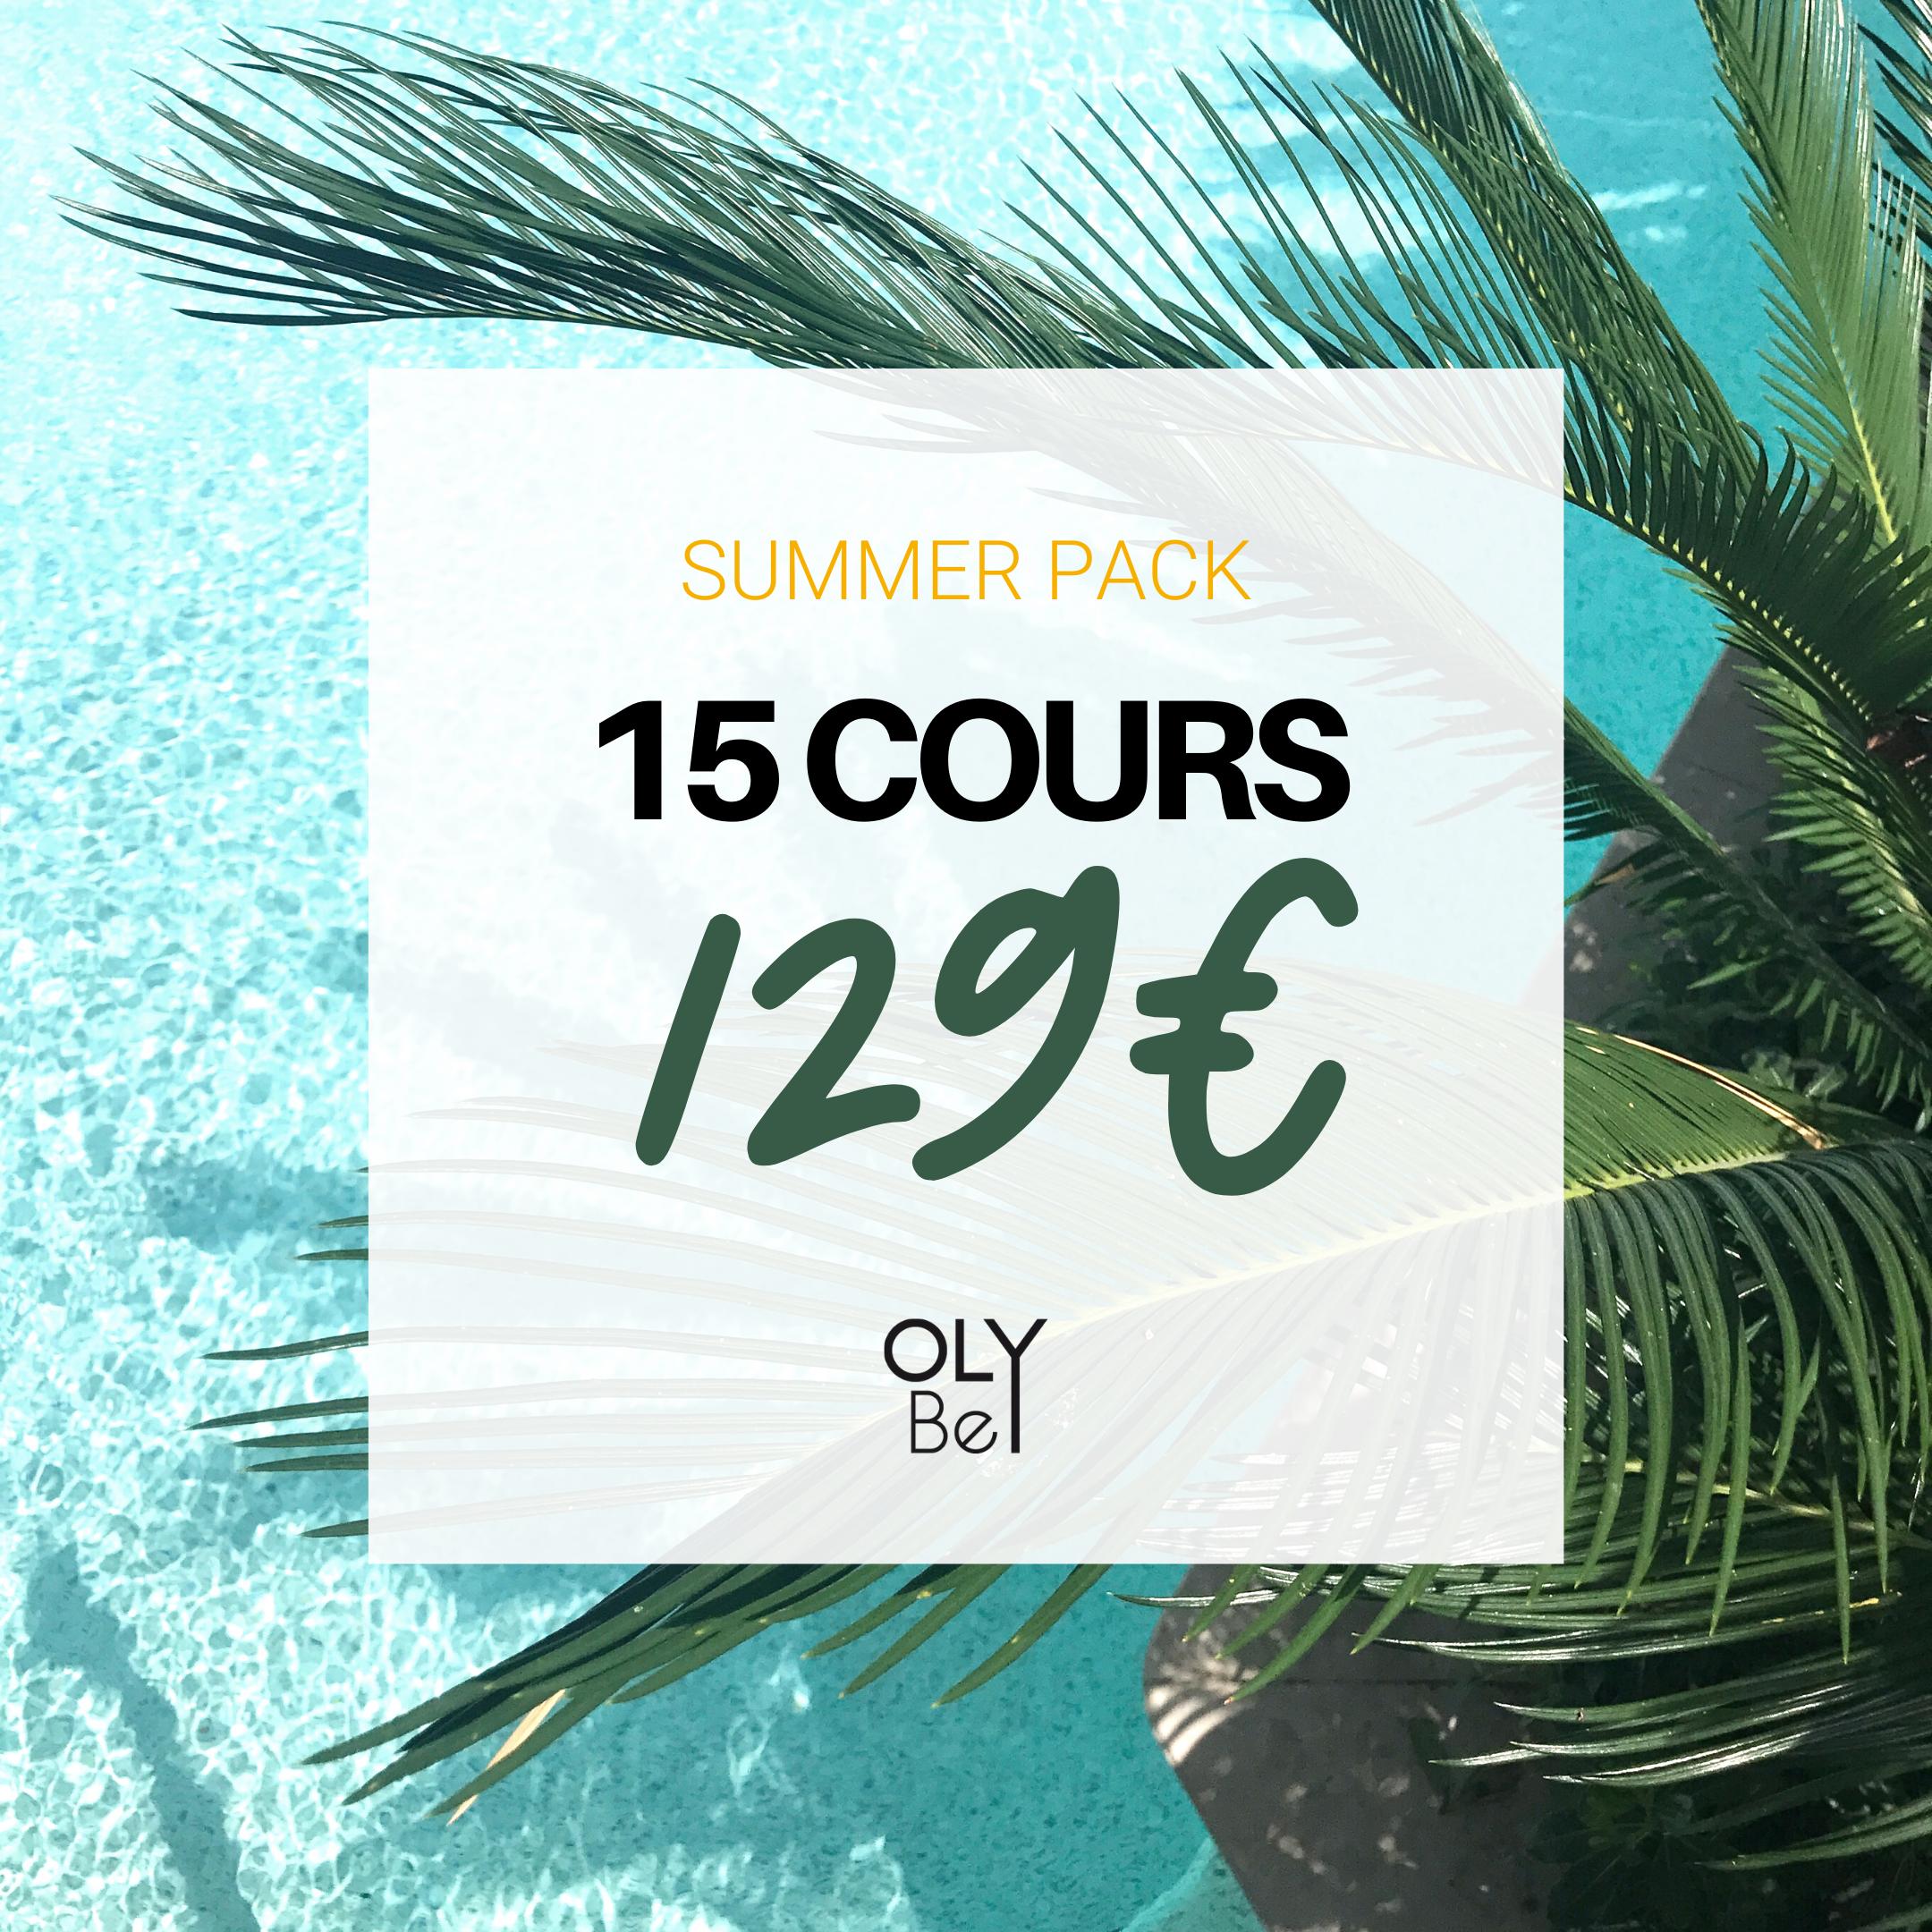 15 COURS =  129€   💥 Soit  8,6€ le cours  ! 📆 Valable  6 mois